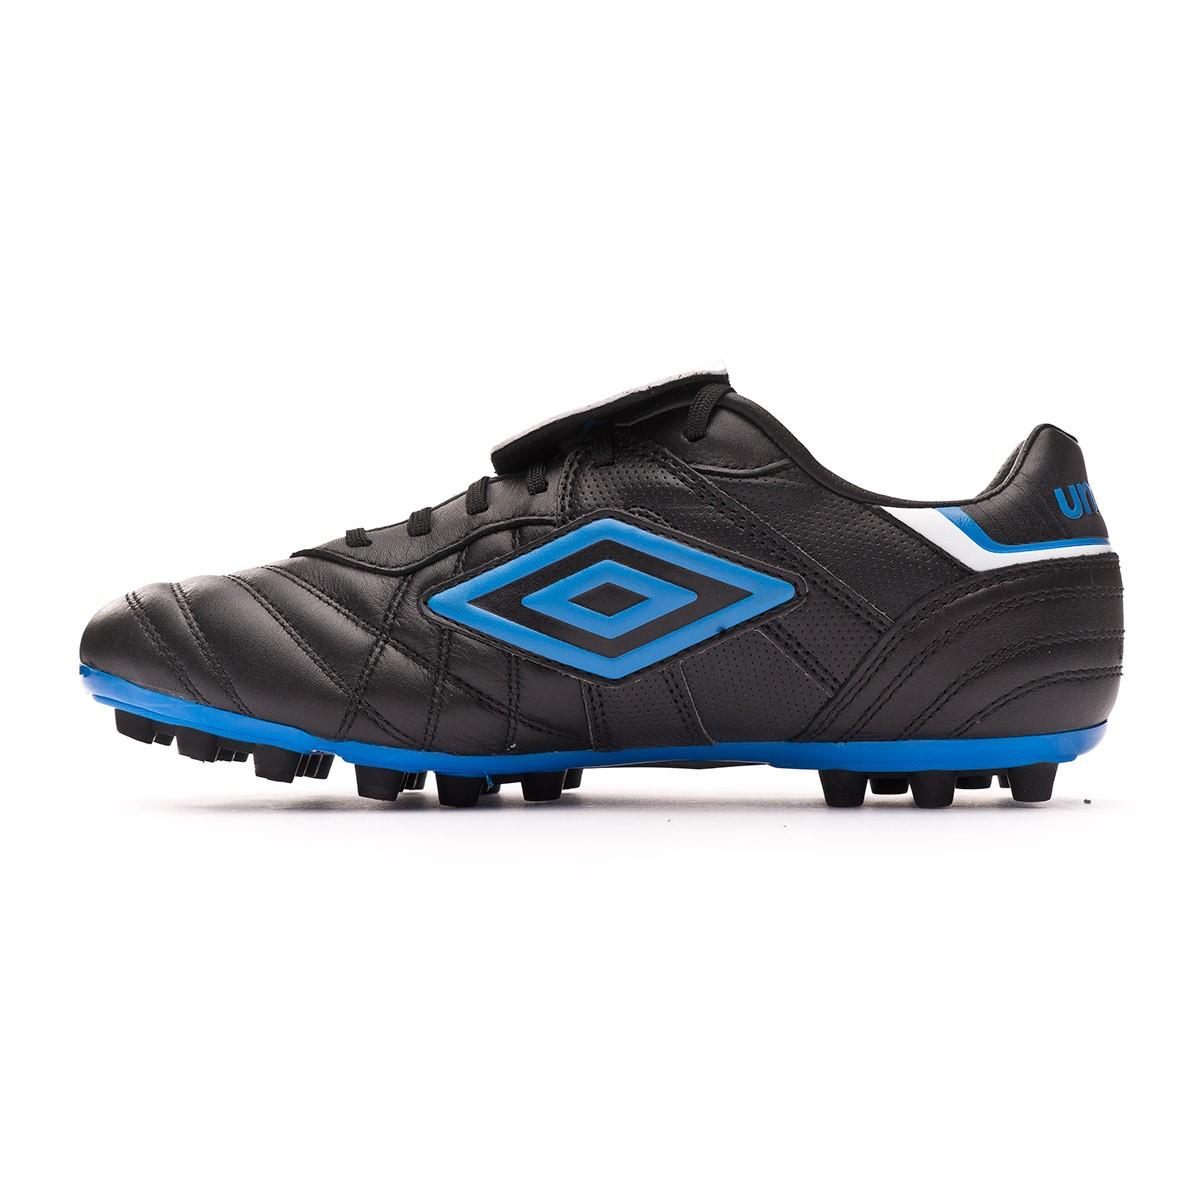 e66dacc55 Football Boots Umbro Speciali Eternal Team AG Black-Blue - Football store  Fútbol Emotion